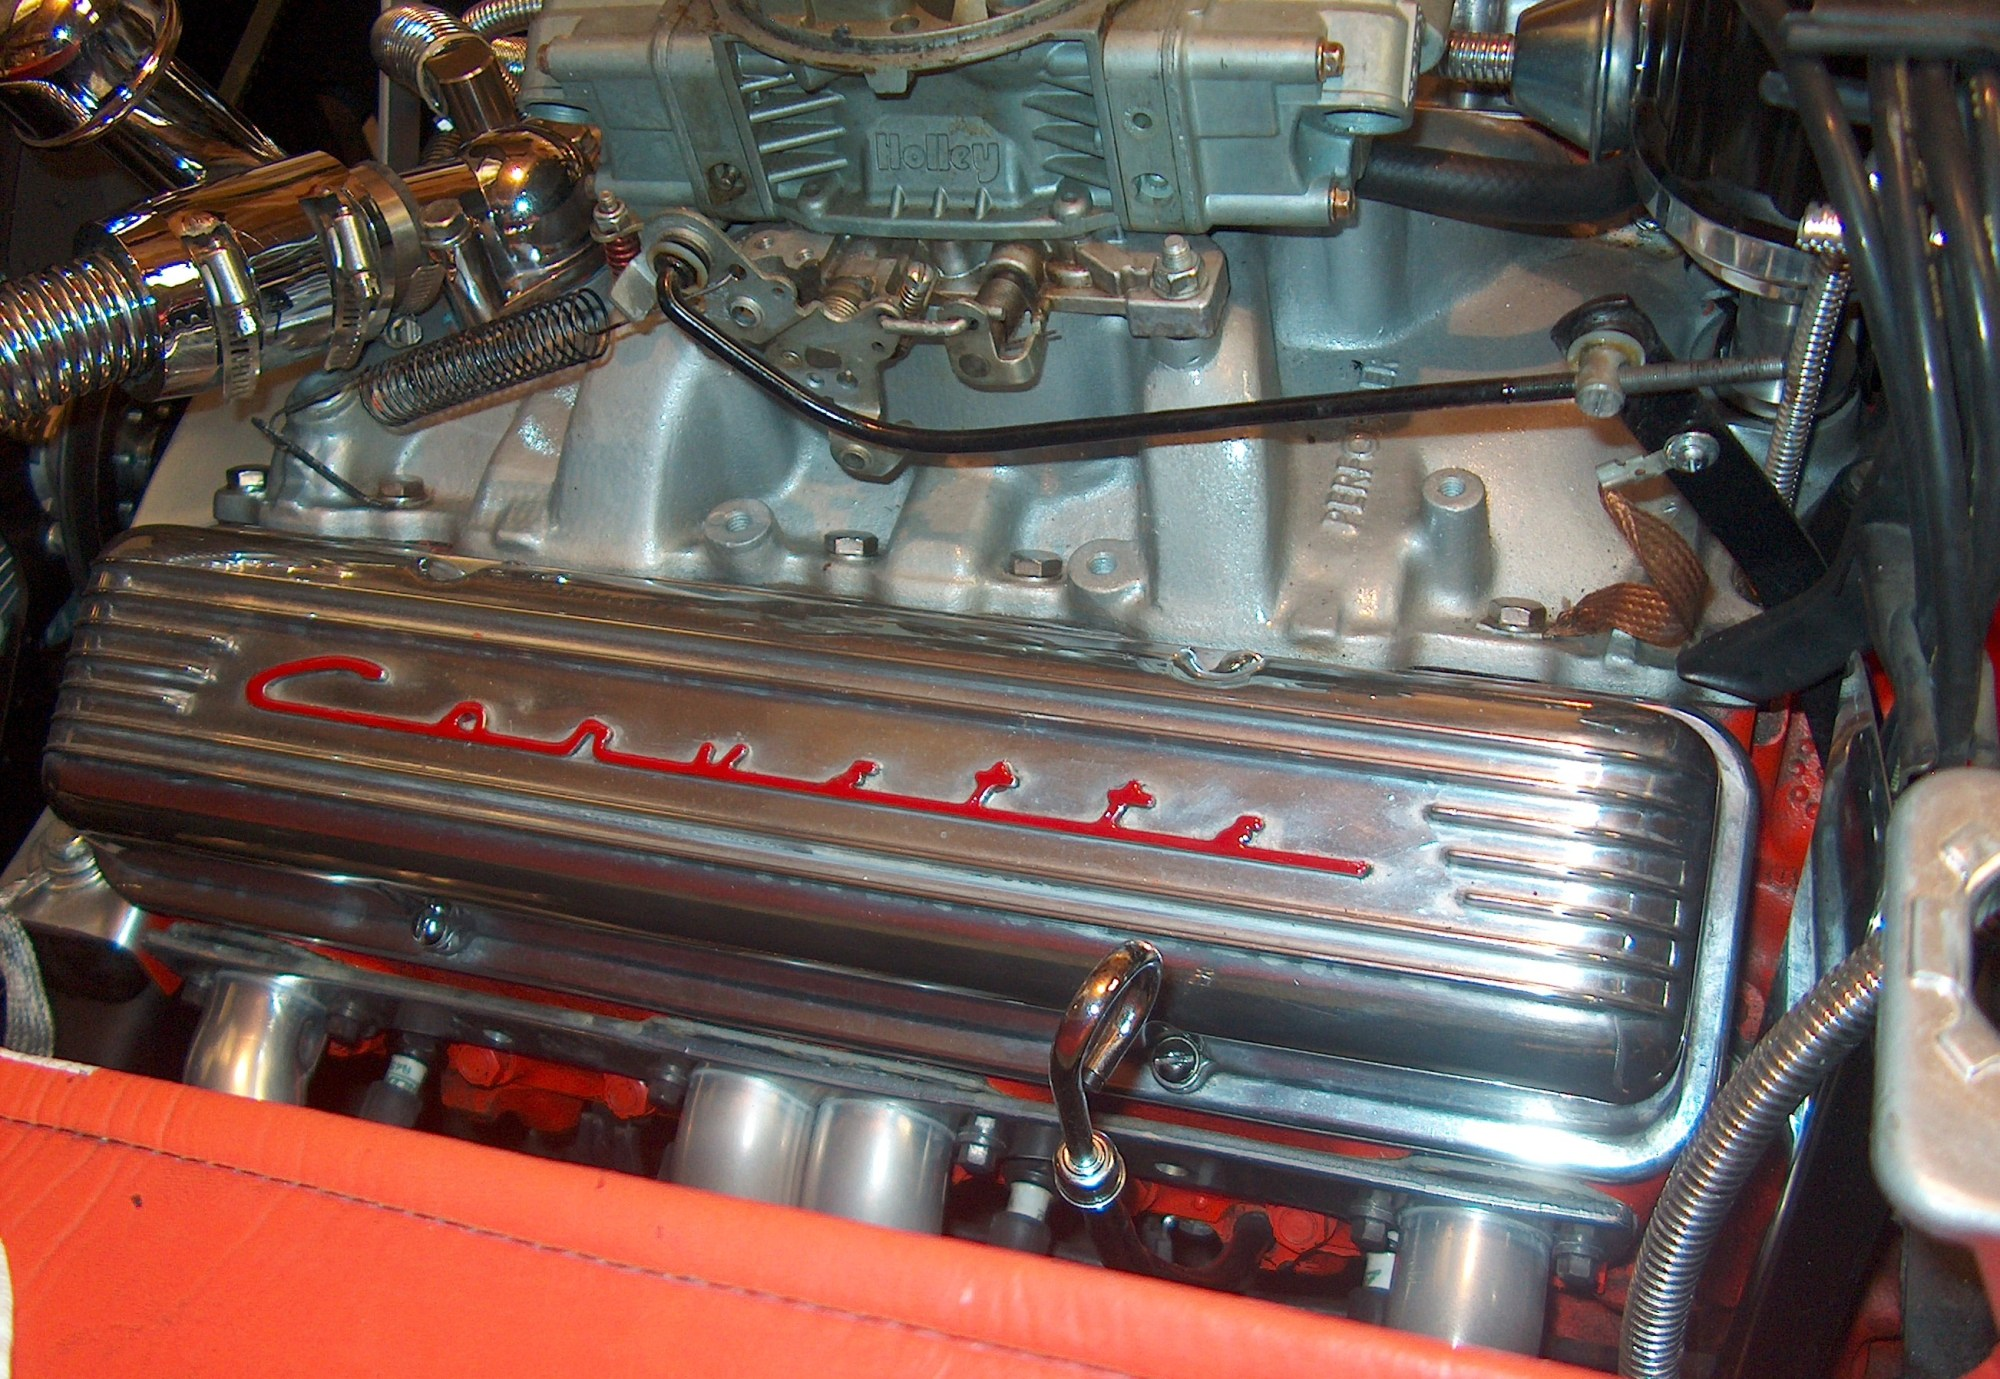 hight resolution of pcv valve recommendations for 64 327 350 corvetteforum chevrolet corvette forum discussion